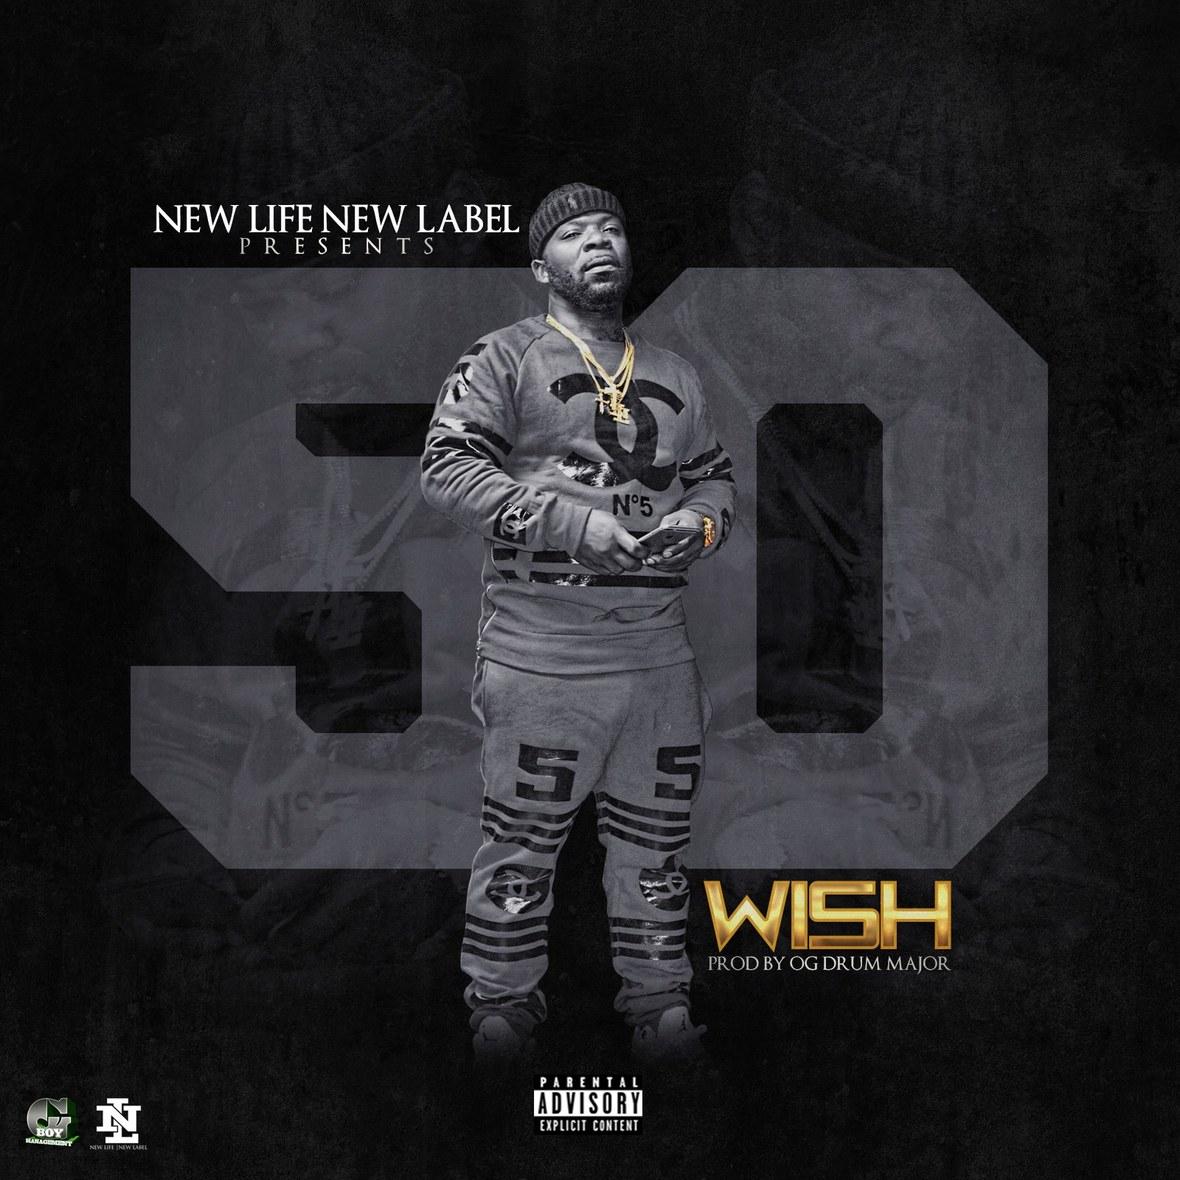 Wish - 50 artwork